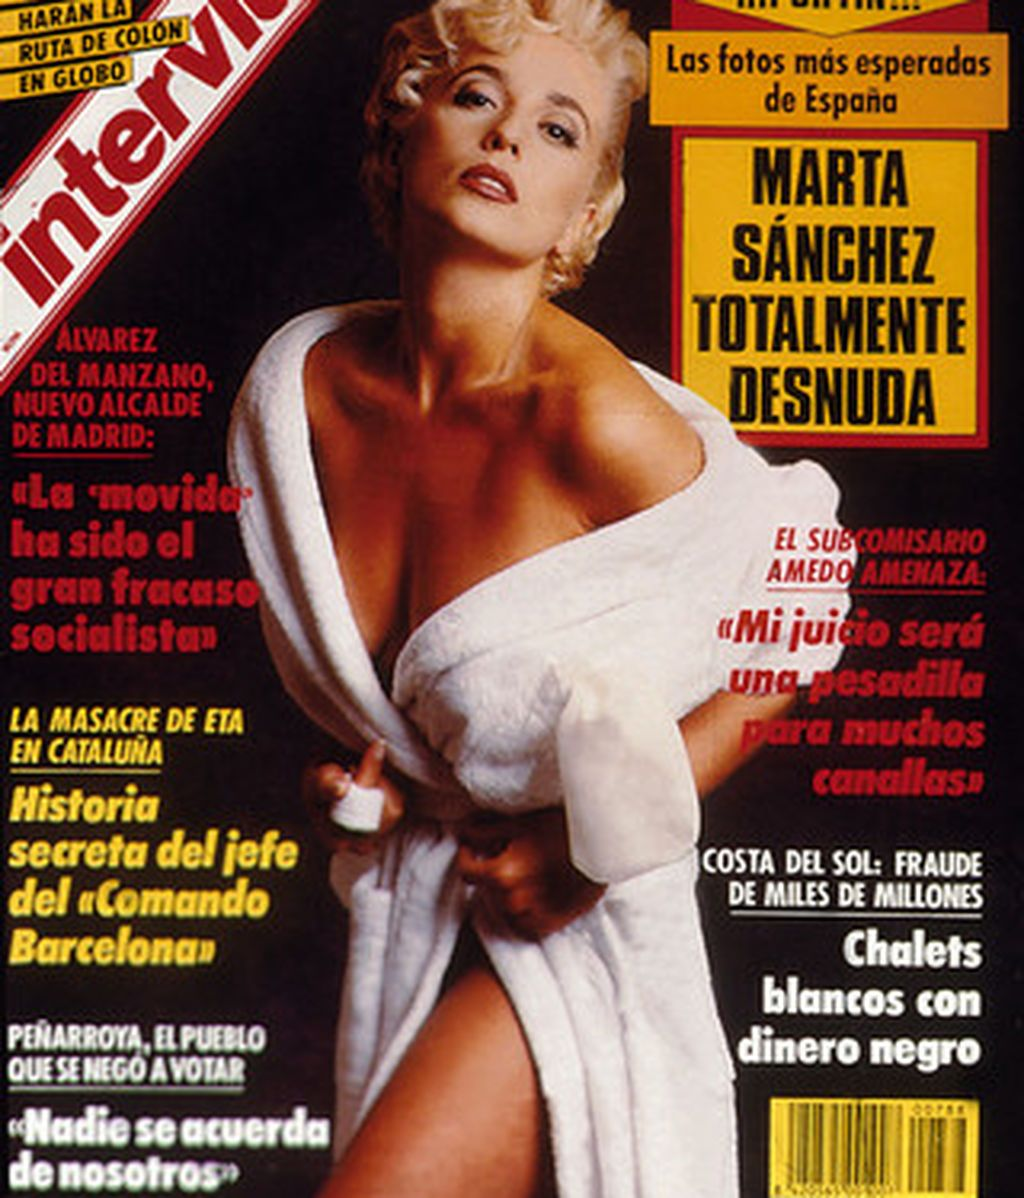 Marta Sánchez Interviú